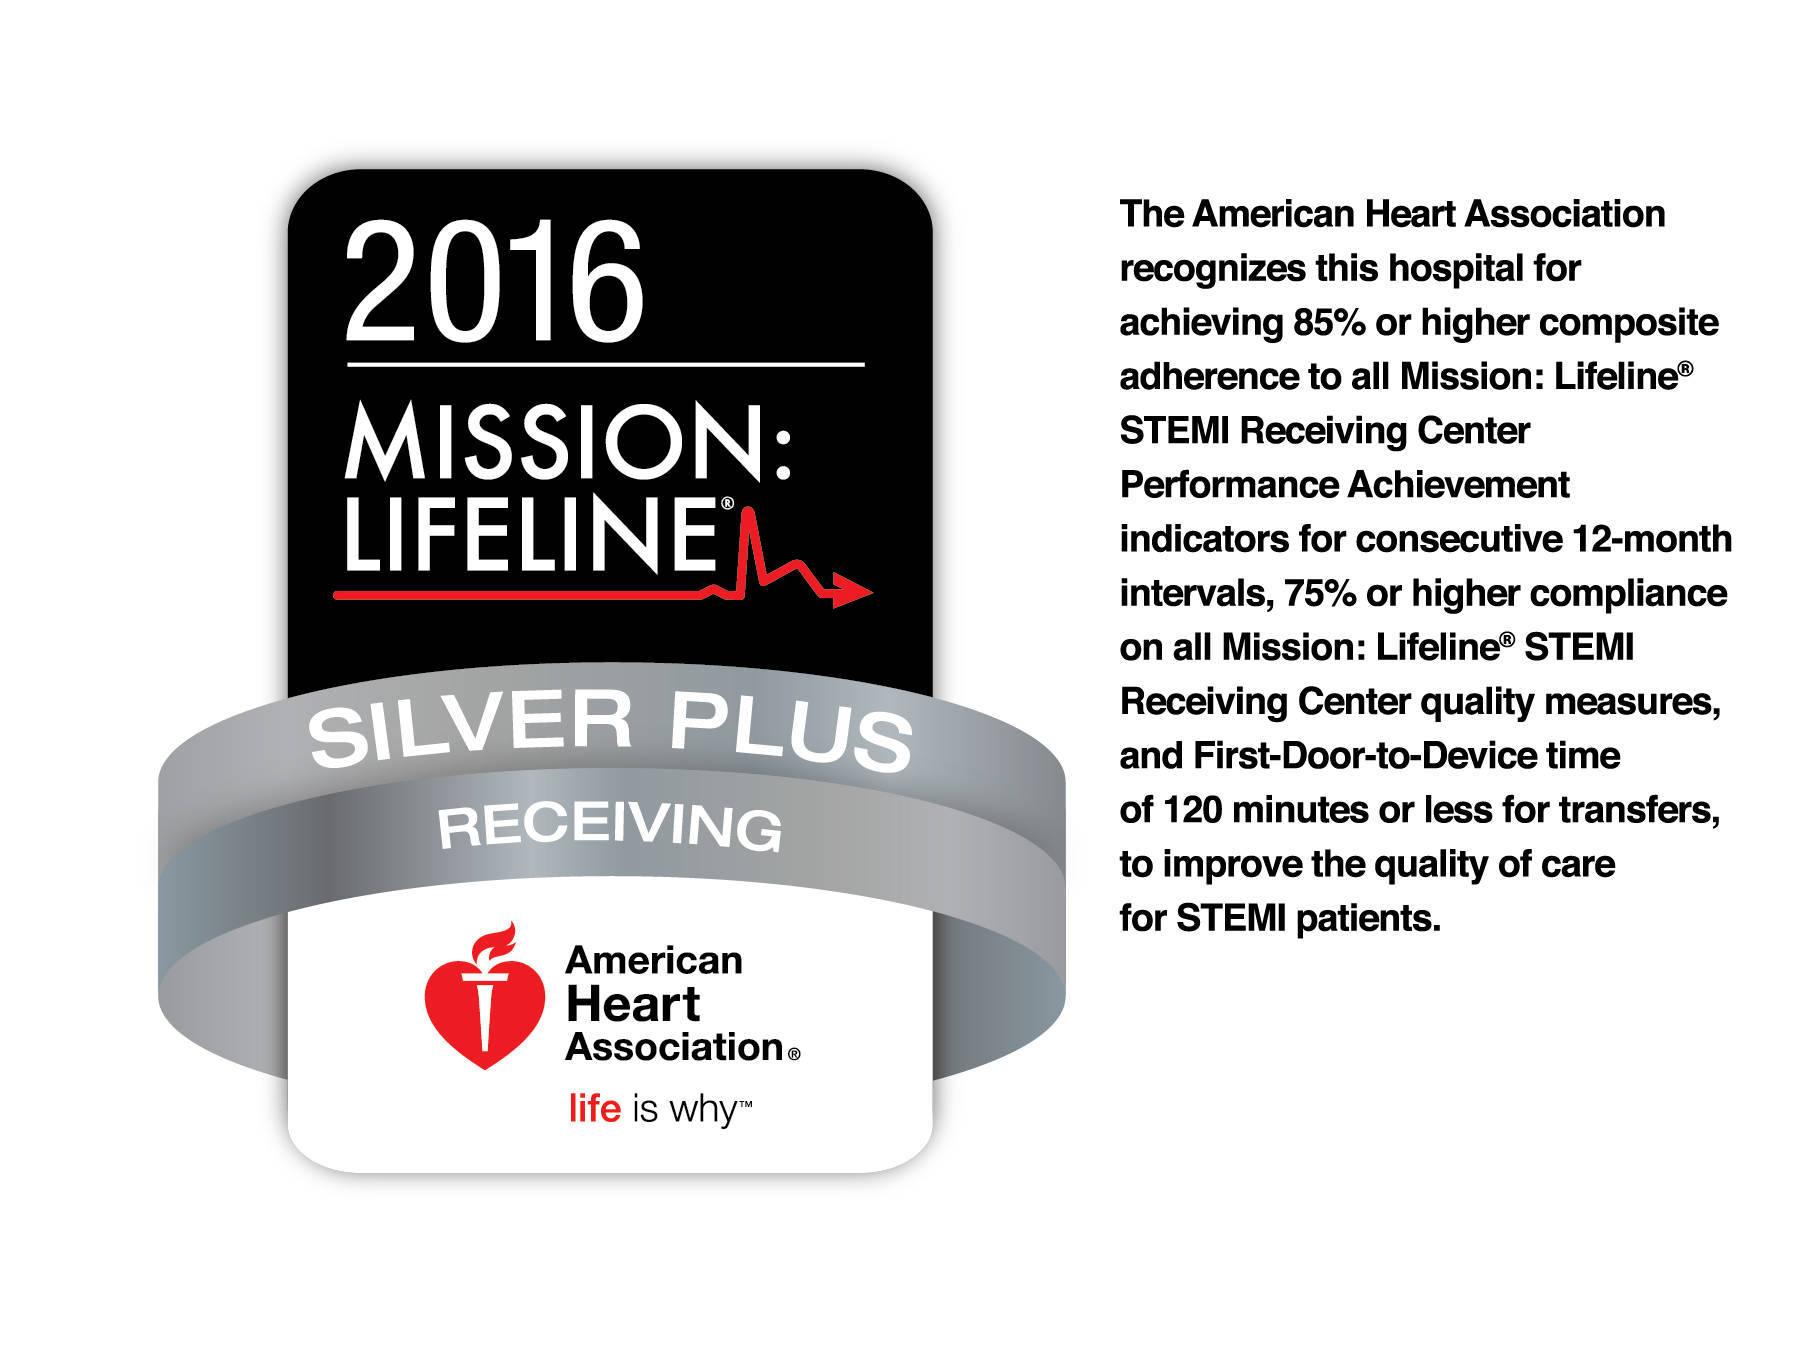 5570ee7c578c561025d2_Mission_LifeLine_Silver_Plus_Award.jpg